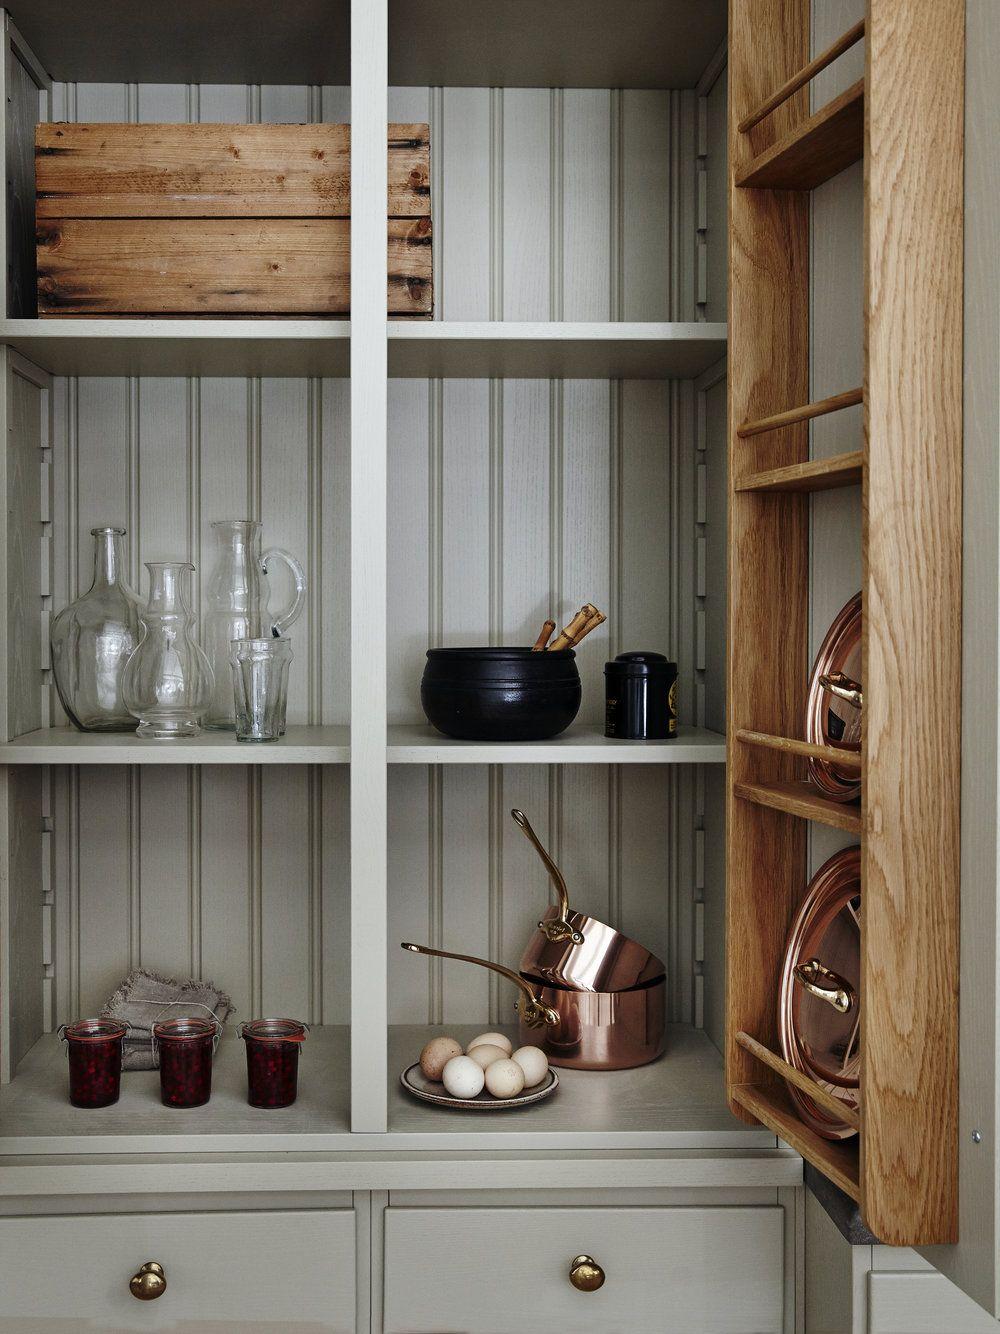 kitchen and beyond | Home decor | Pinterest